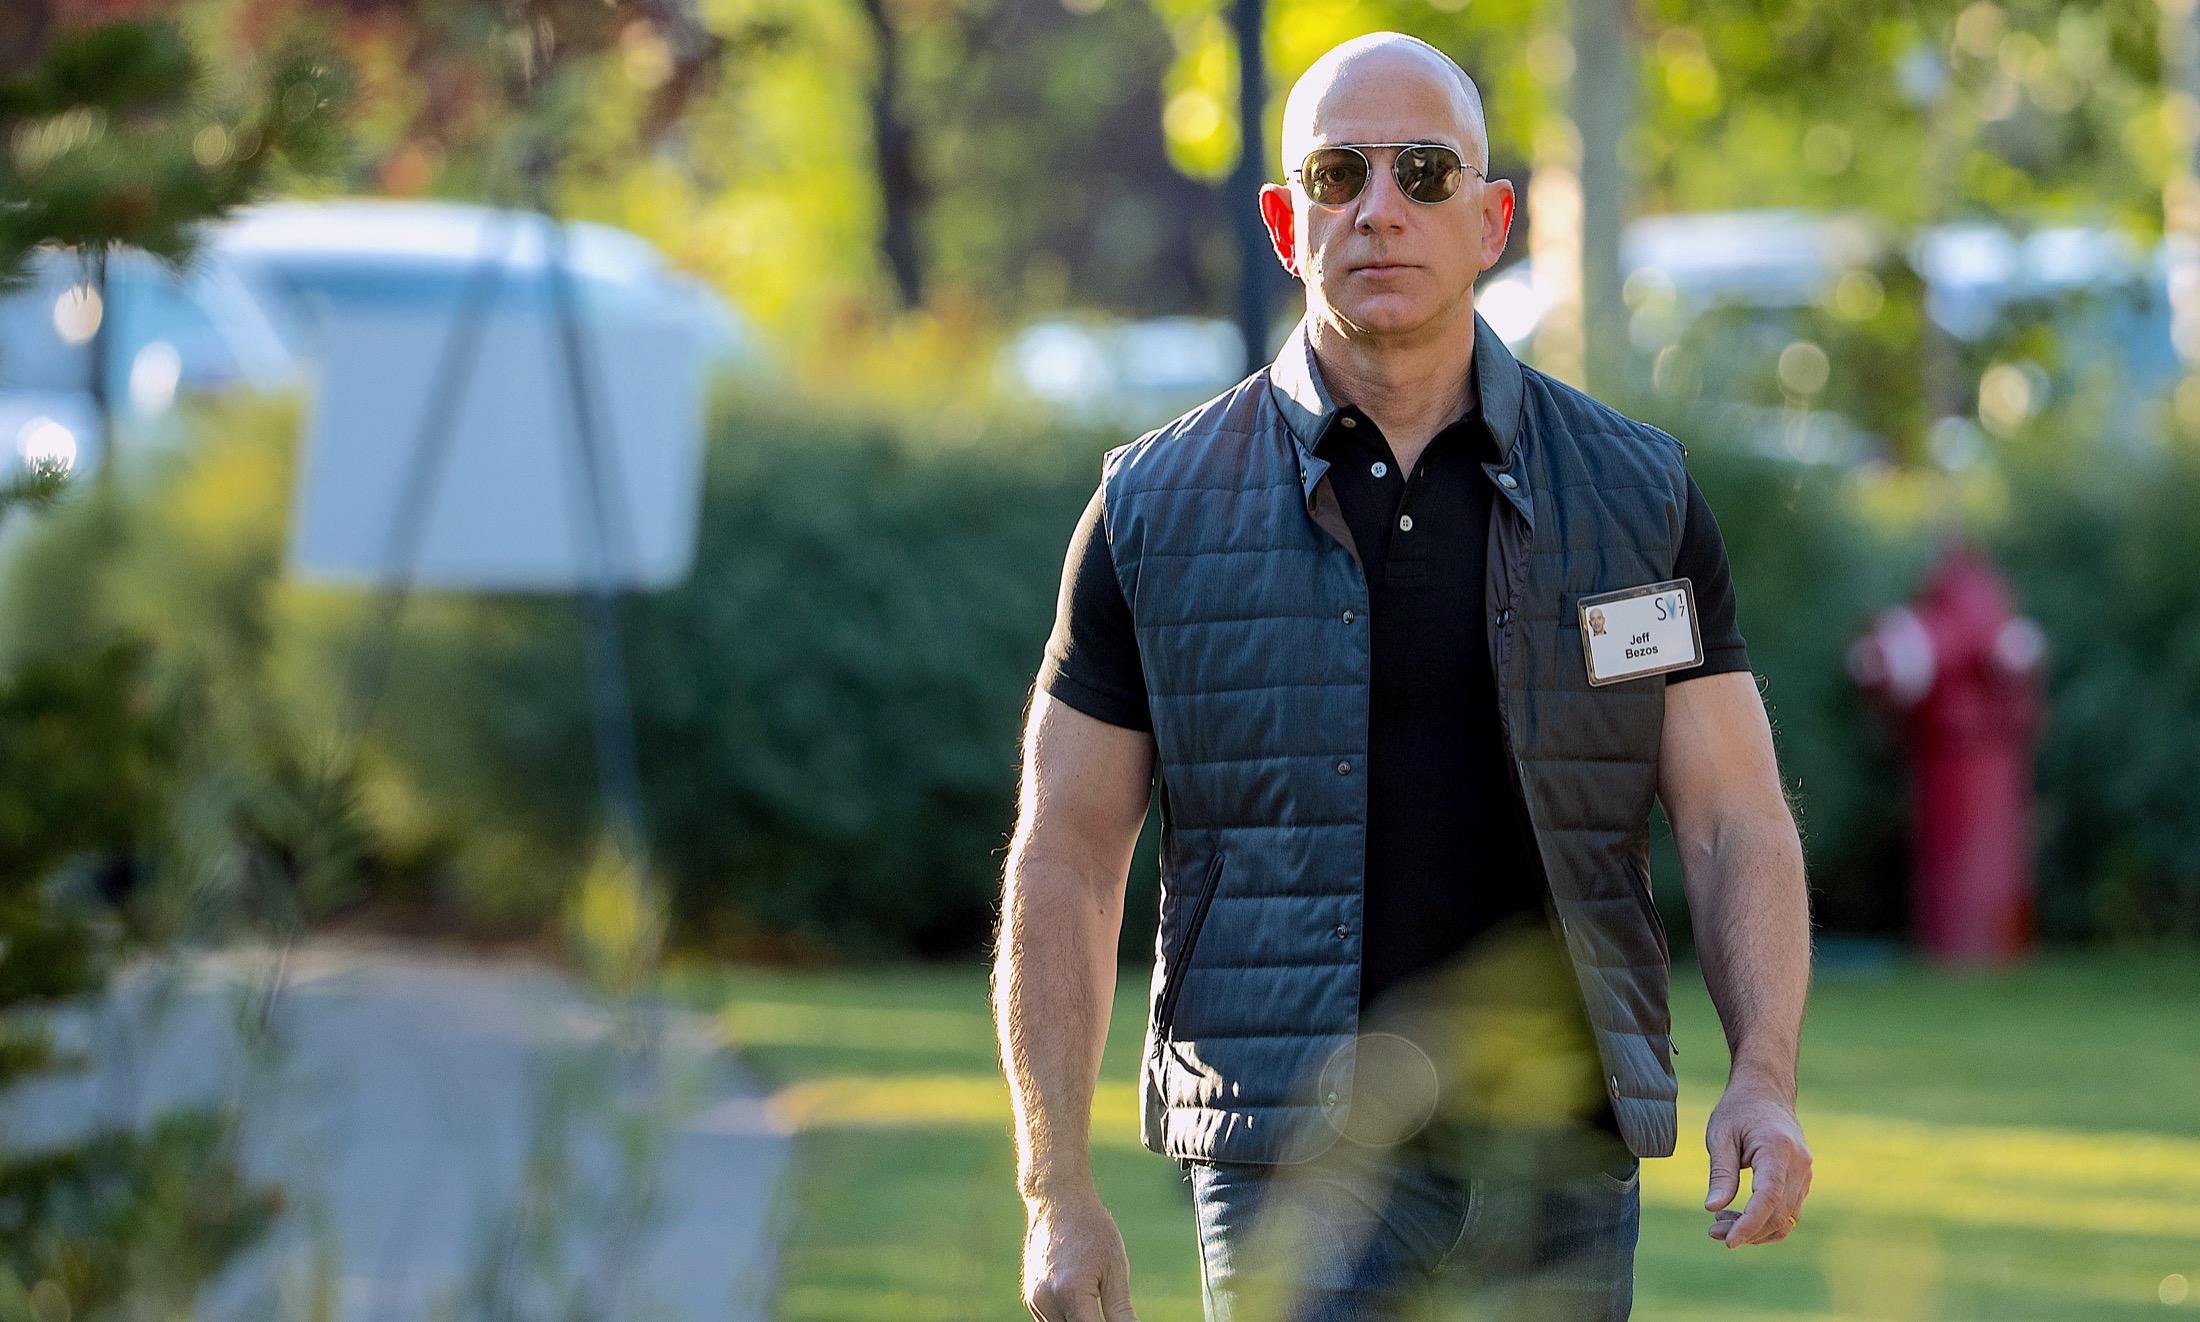 Amazon's Next Step to World Domination is Pinterest